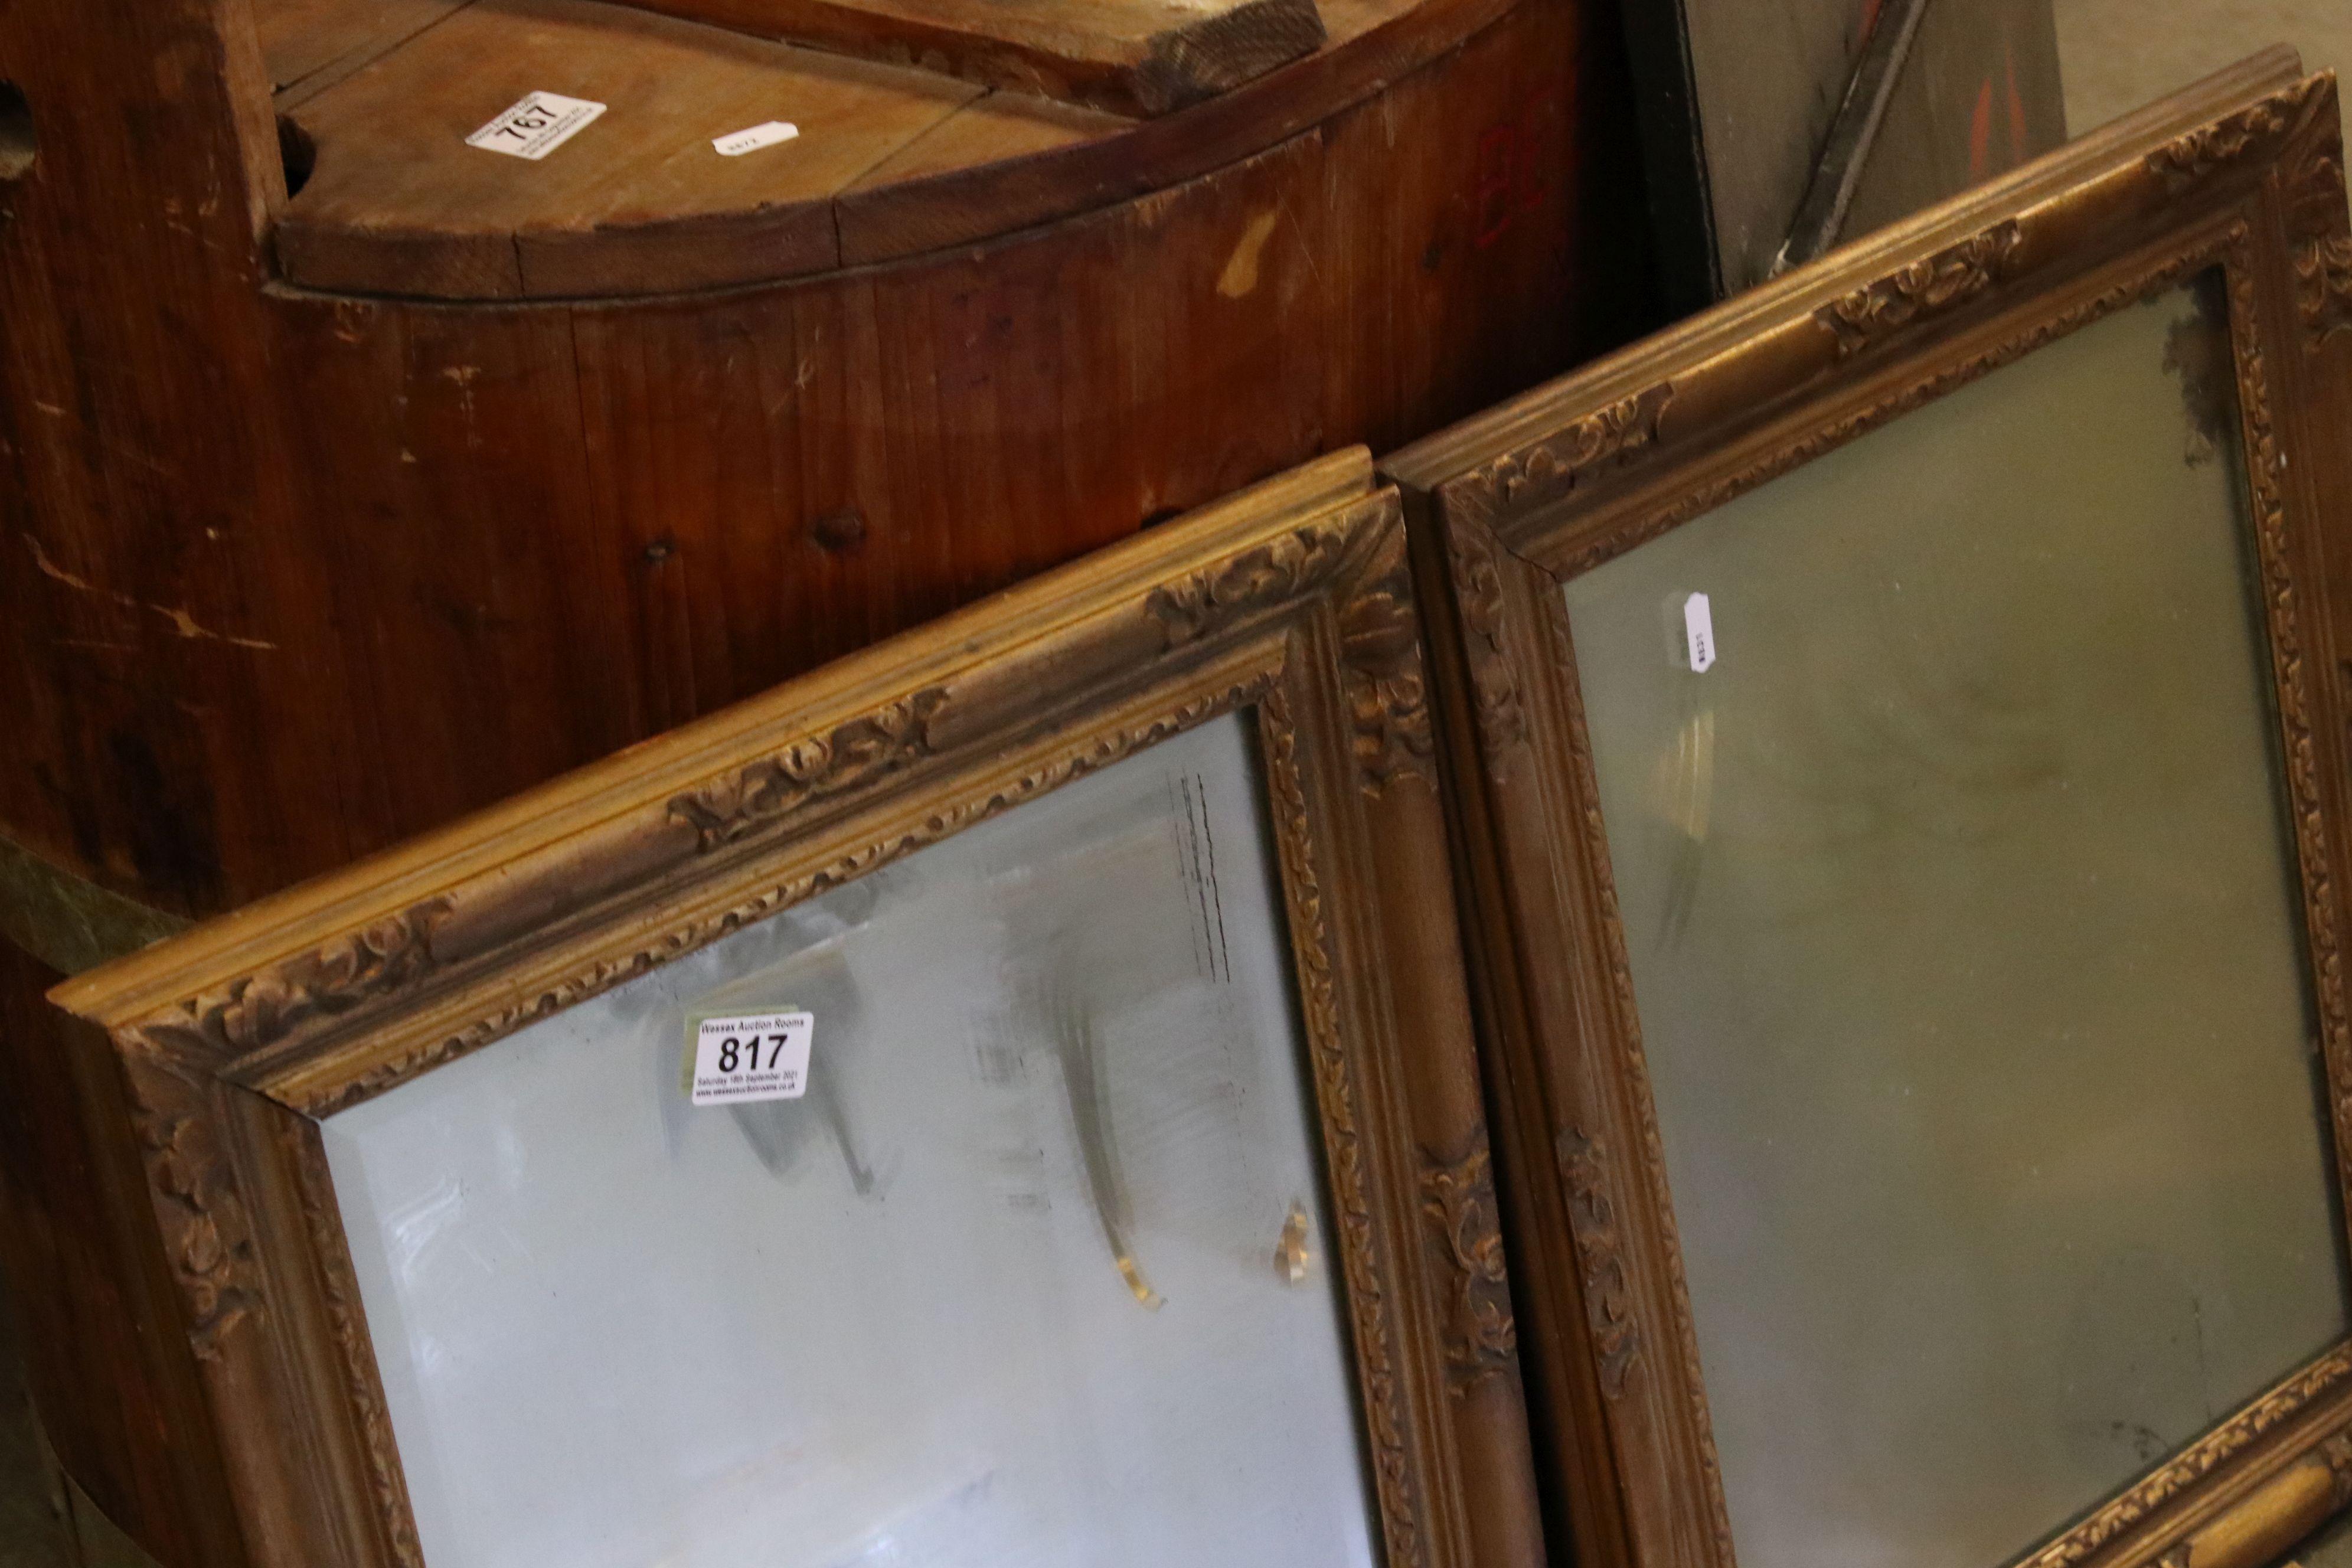 Pair of Rectangular Gilt Framed Mirrors, 44cms x 54cms together with another Gilt Framed Mirror - Image 2 of 3